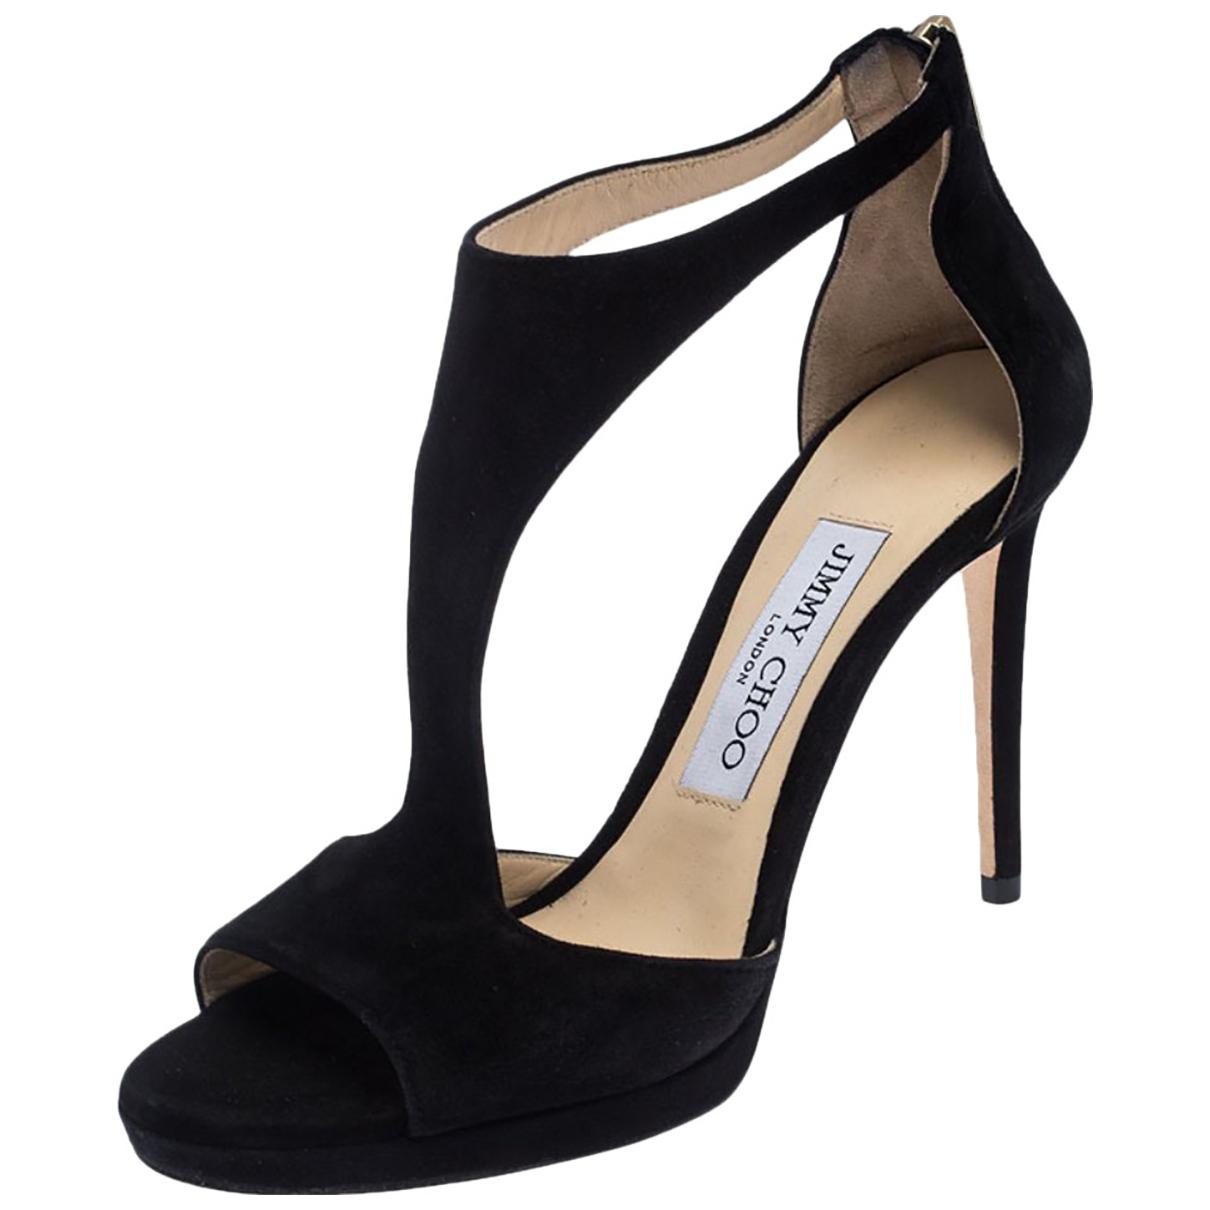 Jimmy Choo \N Black Suede Sandals for Women 35 EU